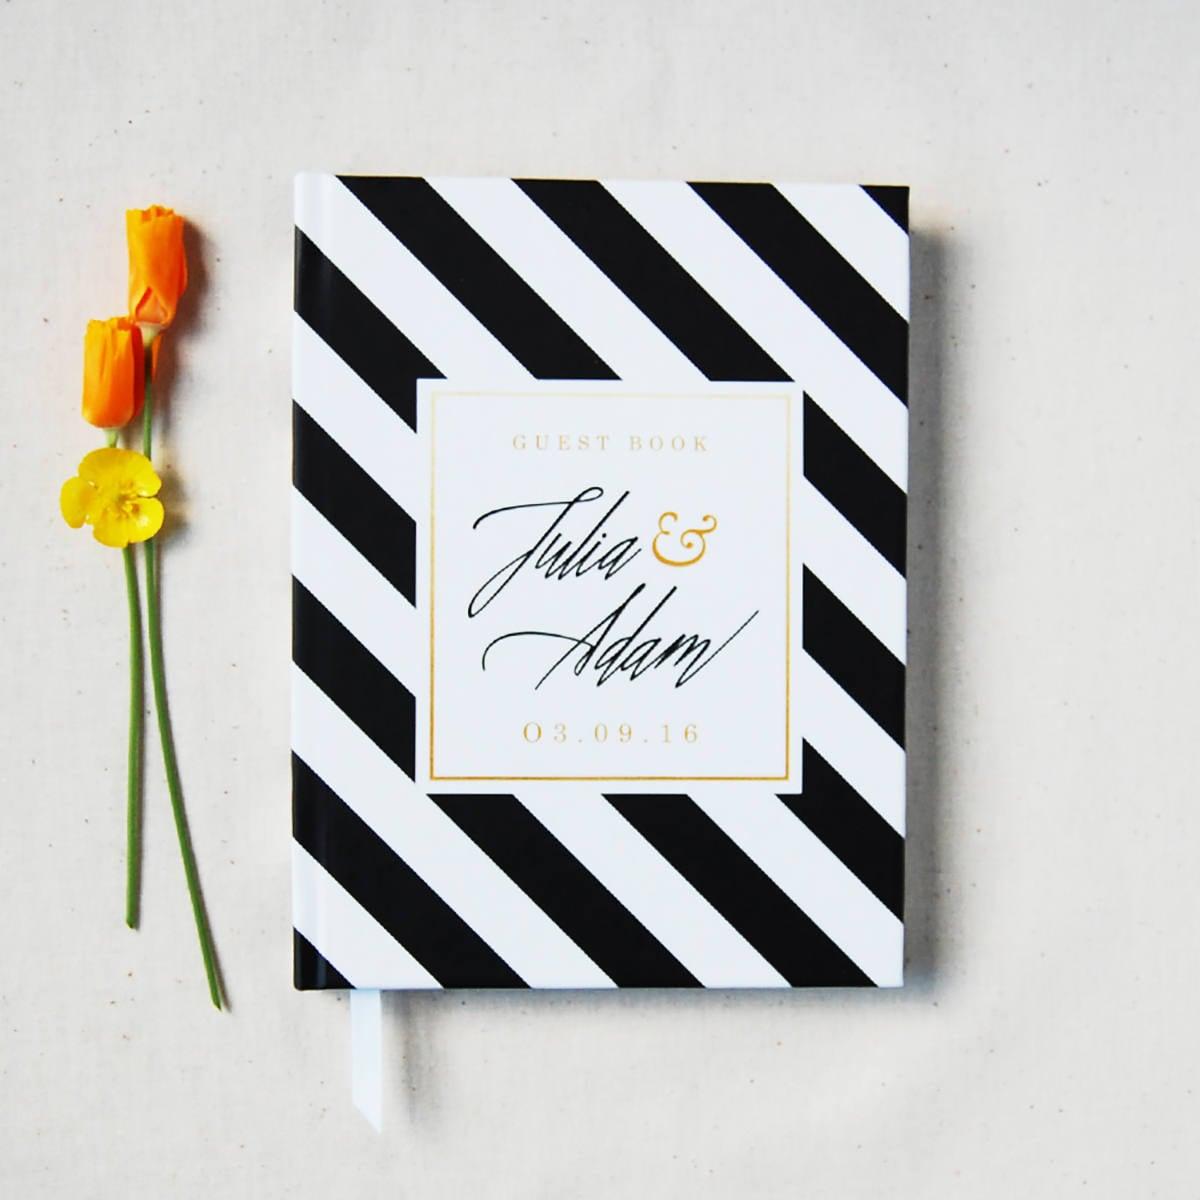 Wedding Guest Book 4 Custom Hardcover Guest Book Wedding